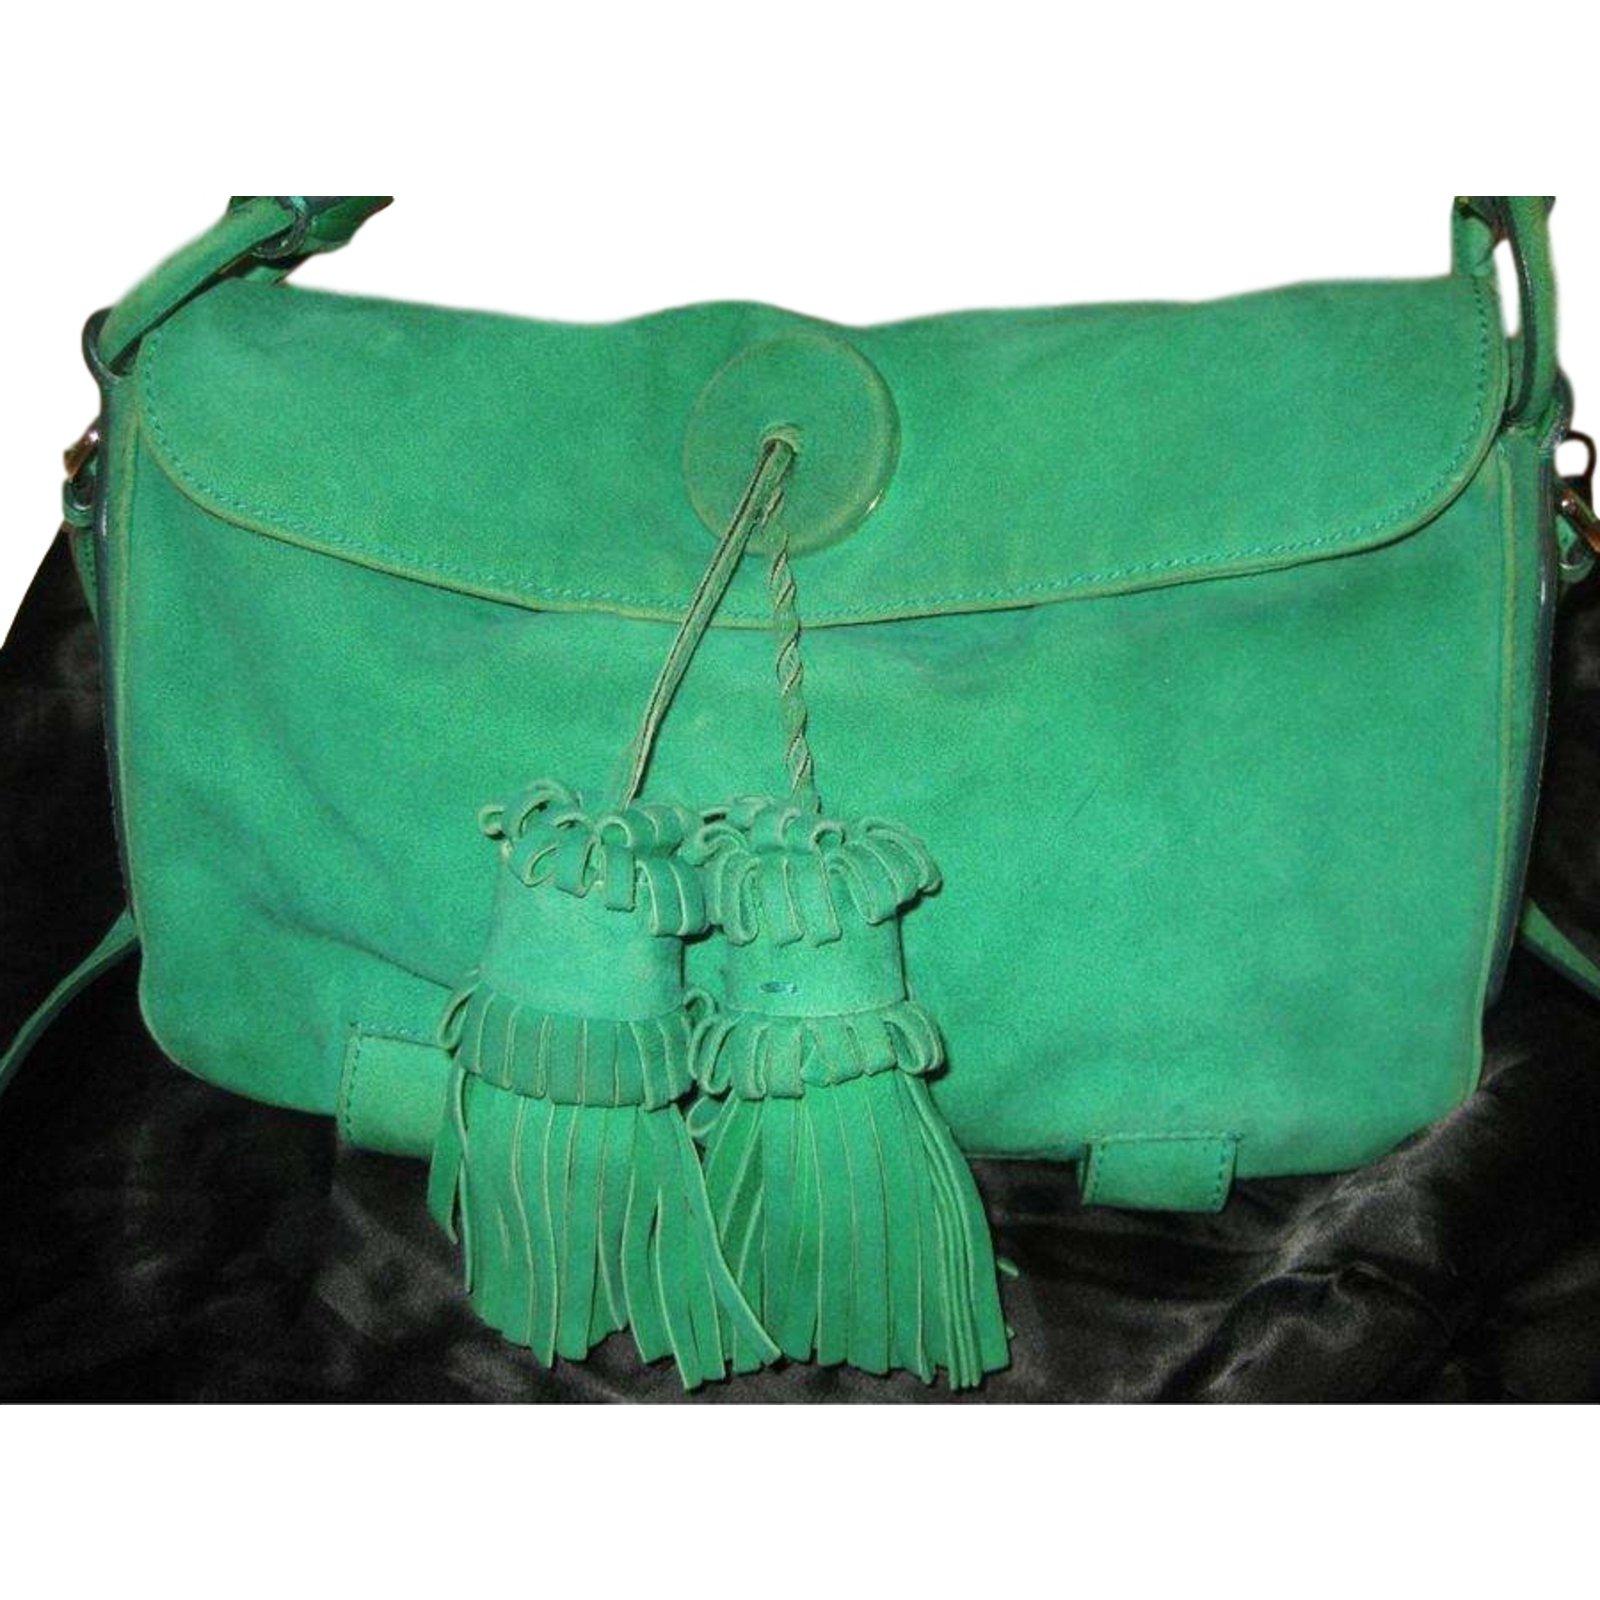 Yves Saint Laurent Handbags Handbags Deerskin Green ref.14719 - Joli Closet 98d0e1131f